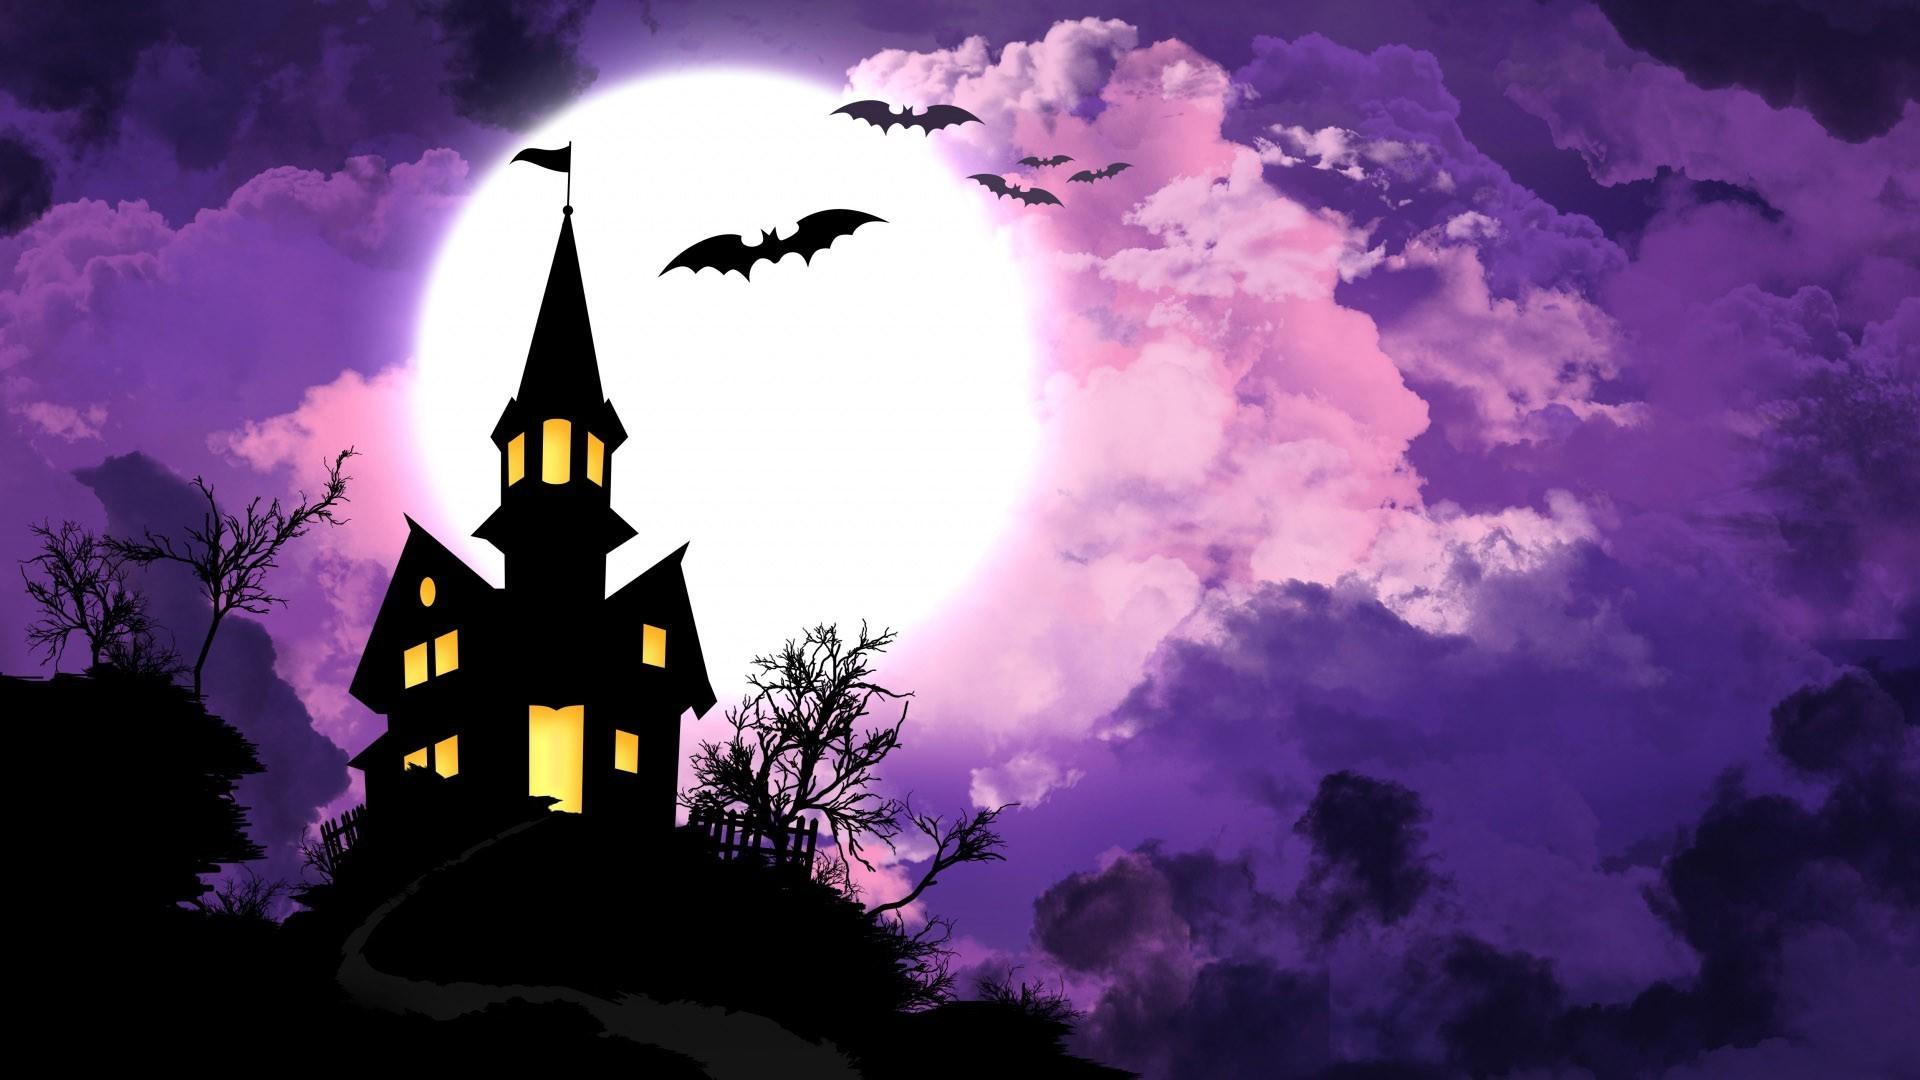 halloween wallpaper background (70+ images)